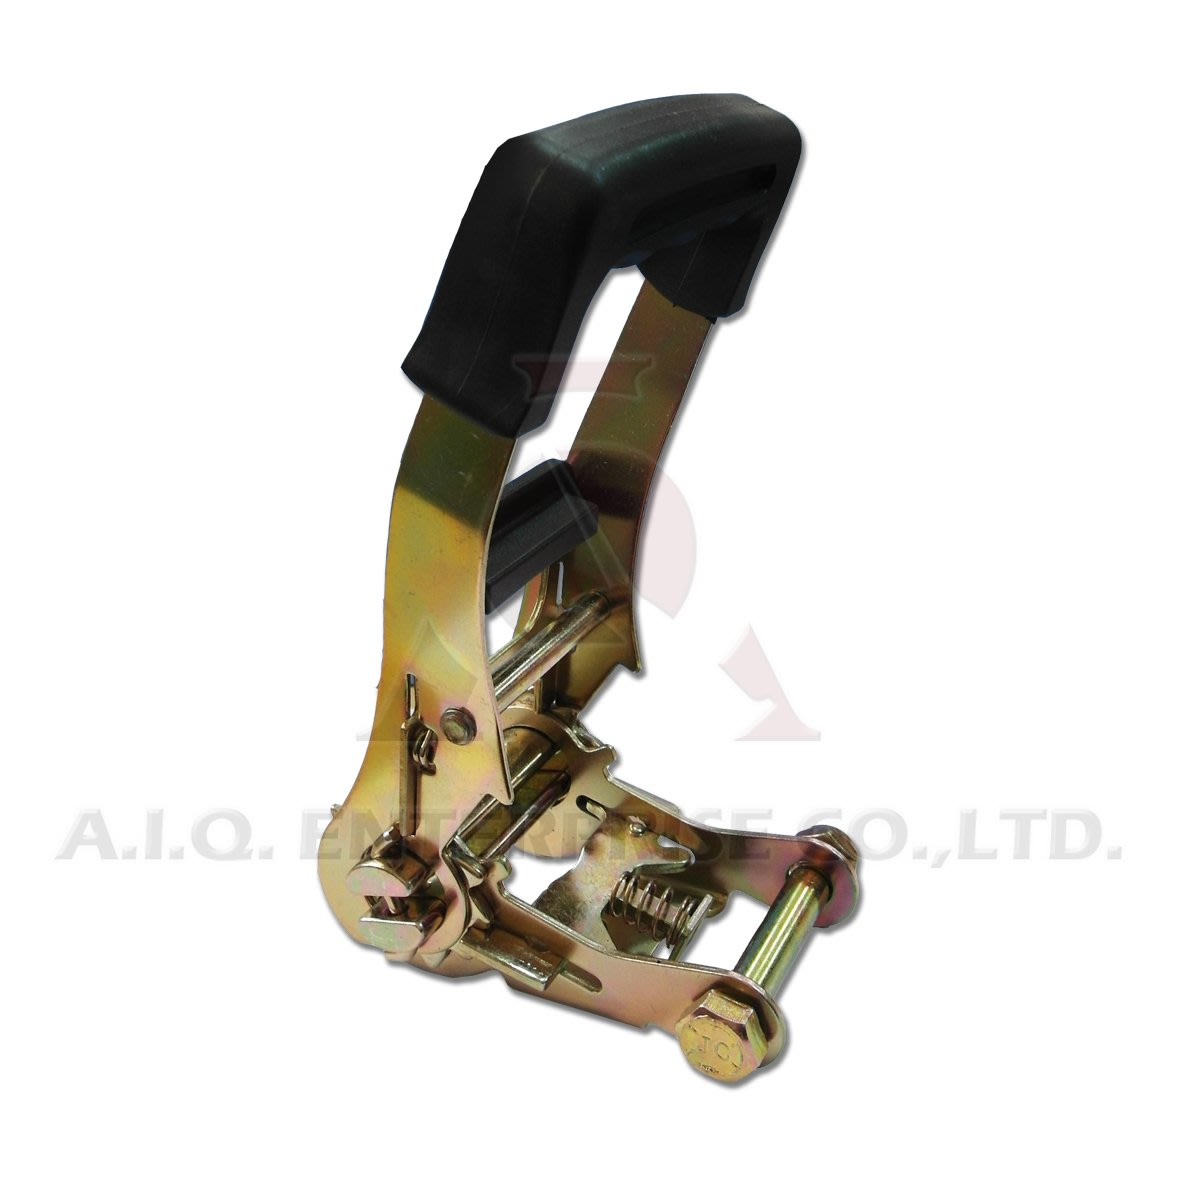 A.I.Q.綑綁帶專家- A0031 中碳鋼熱處理重型棘輪手拉器